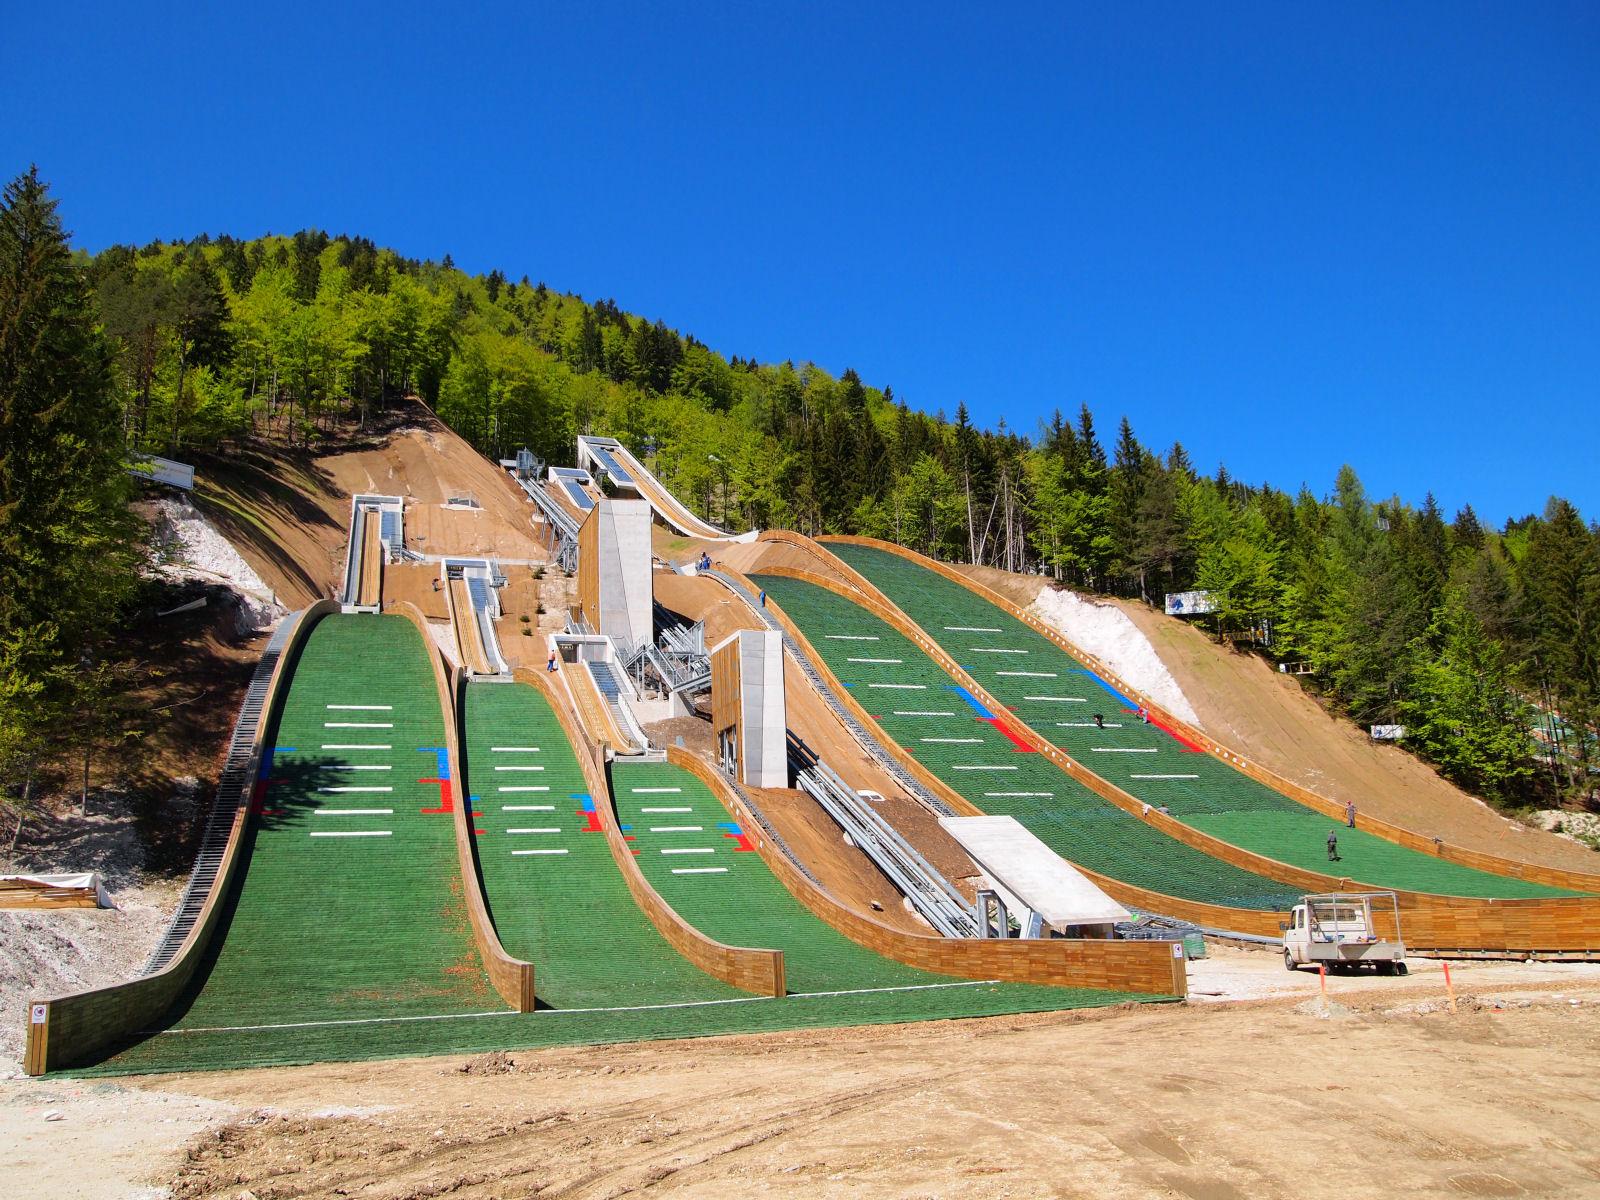 planica-ski-jumping-hills-summer